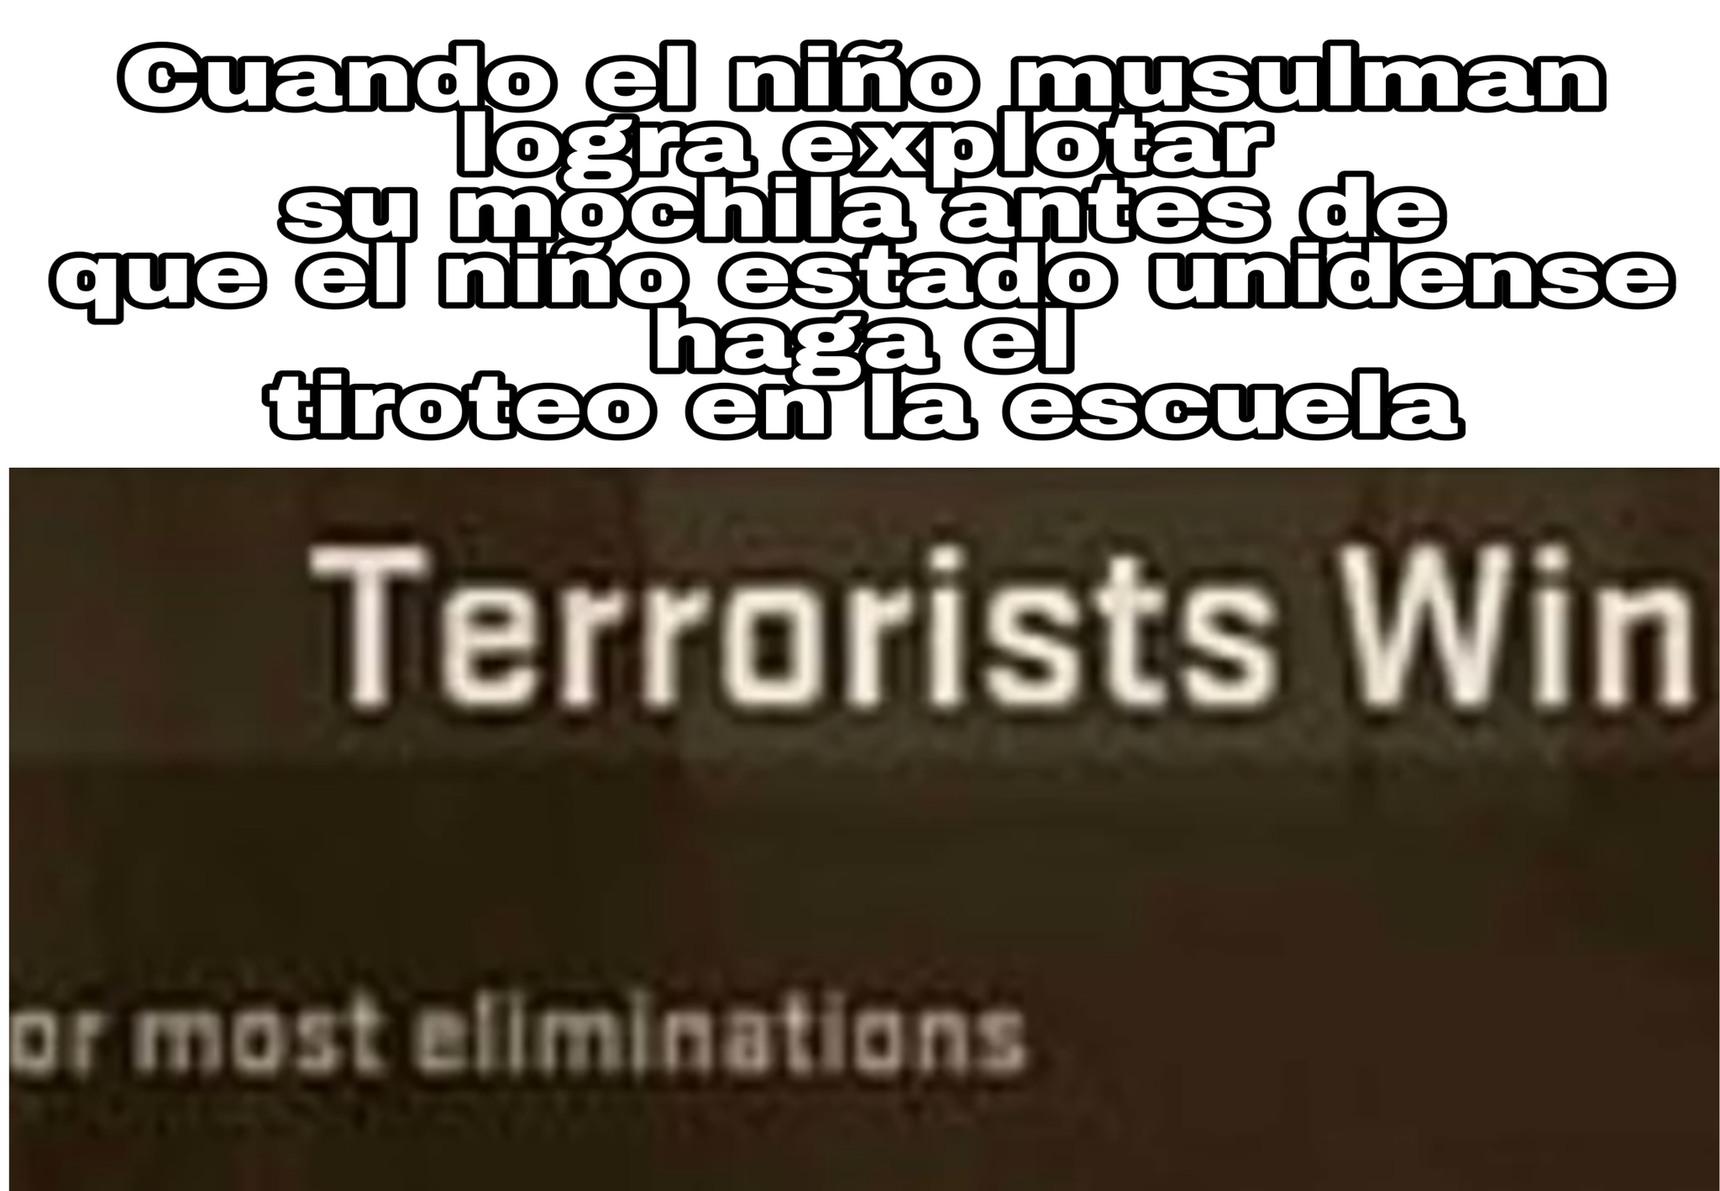 Terrorist wins - meme